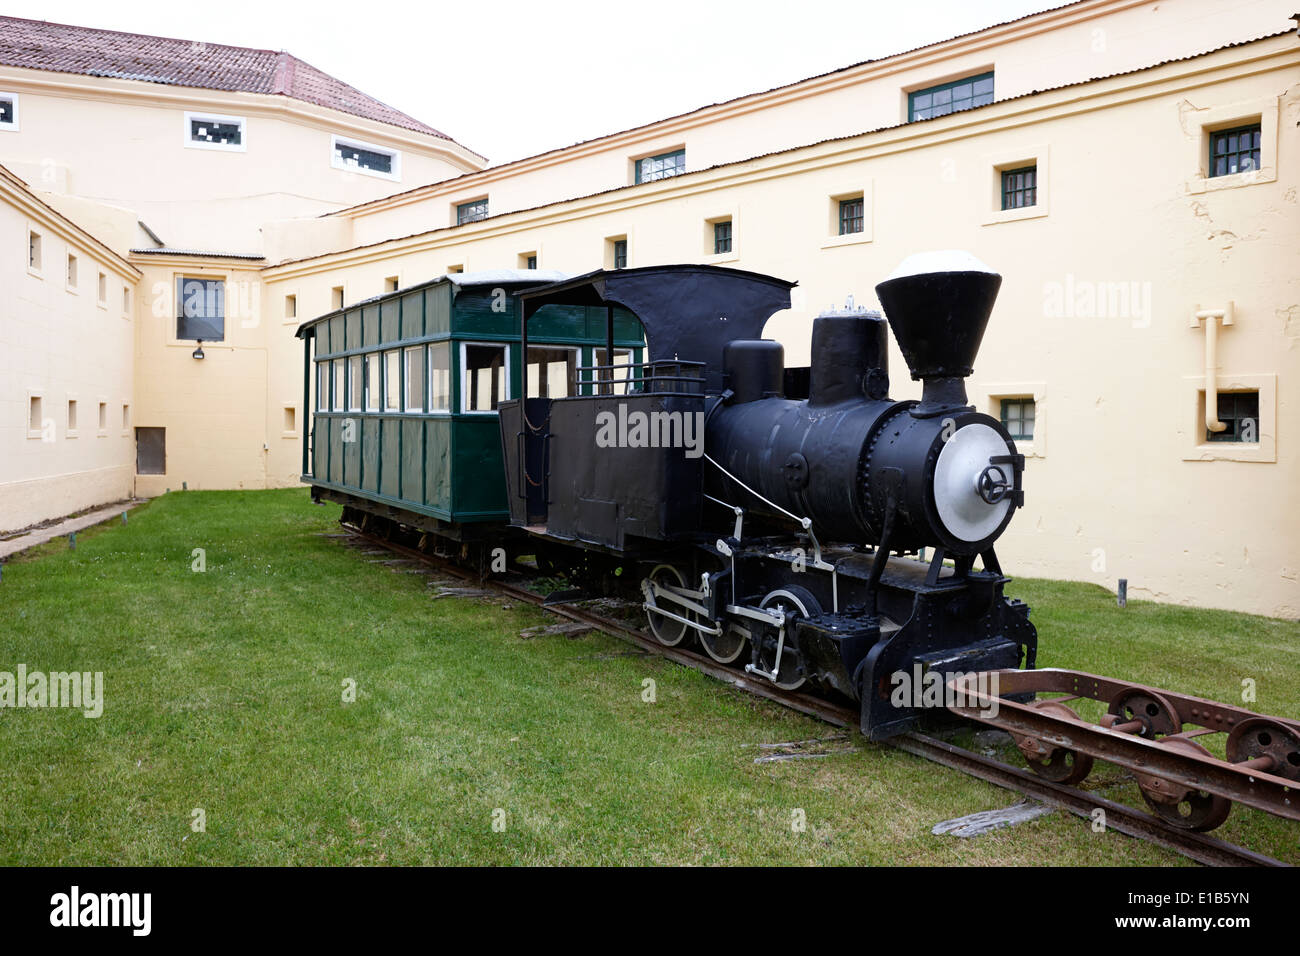 old prisoners train at the maritime museum presidio museo maritimo Ushuaia Argentina - Stock Image